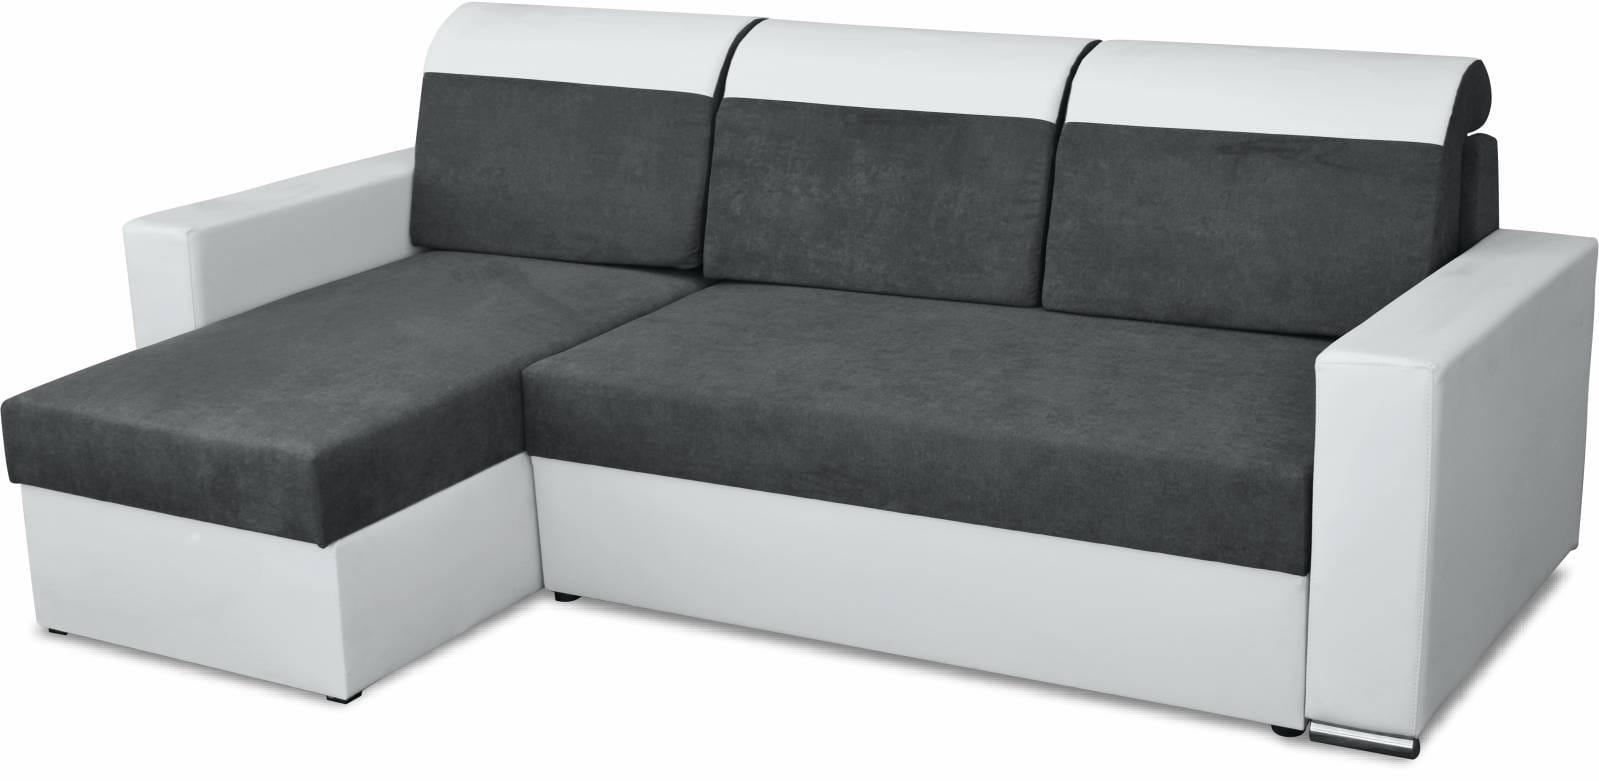 naro nik z funkcj spania zmywalny bird roller bird meble. Black Bedroom Furniture Sets. Home Design Ideas